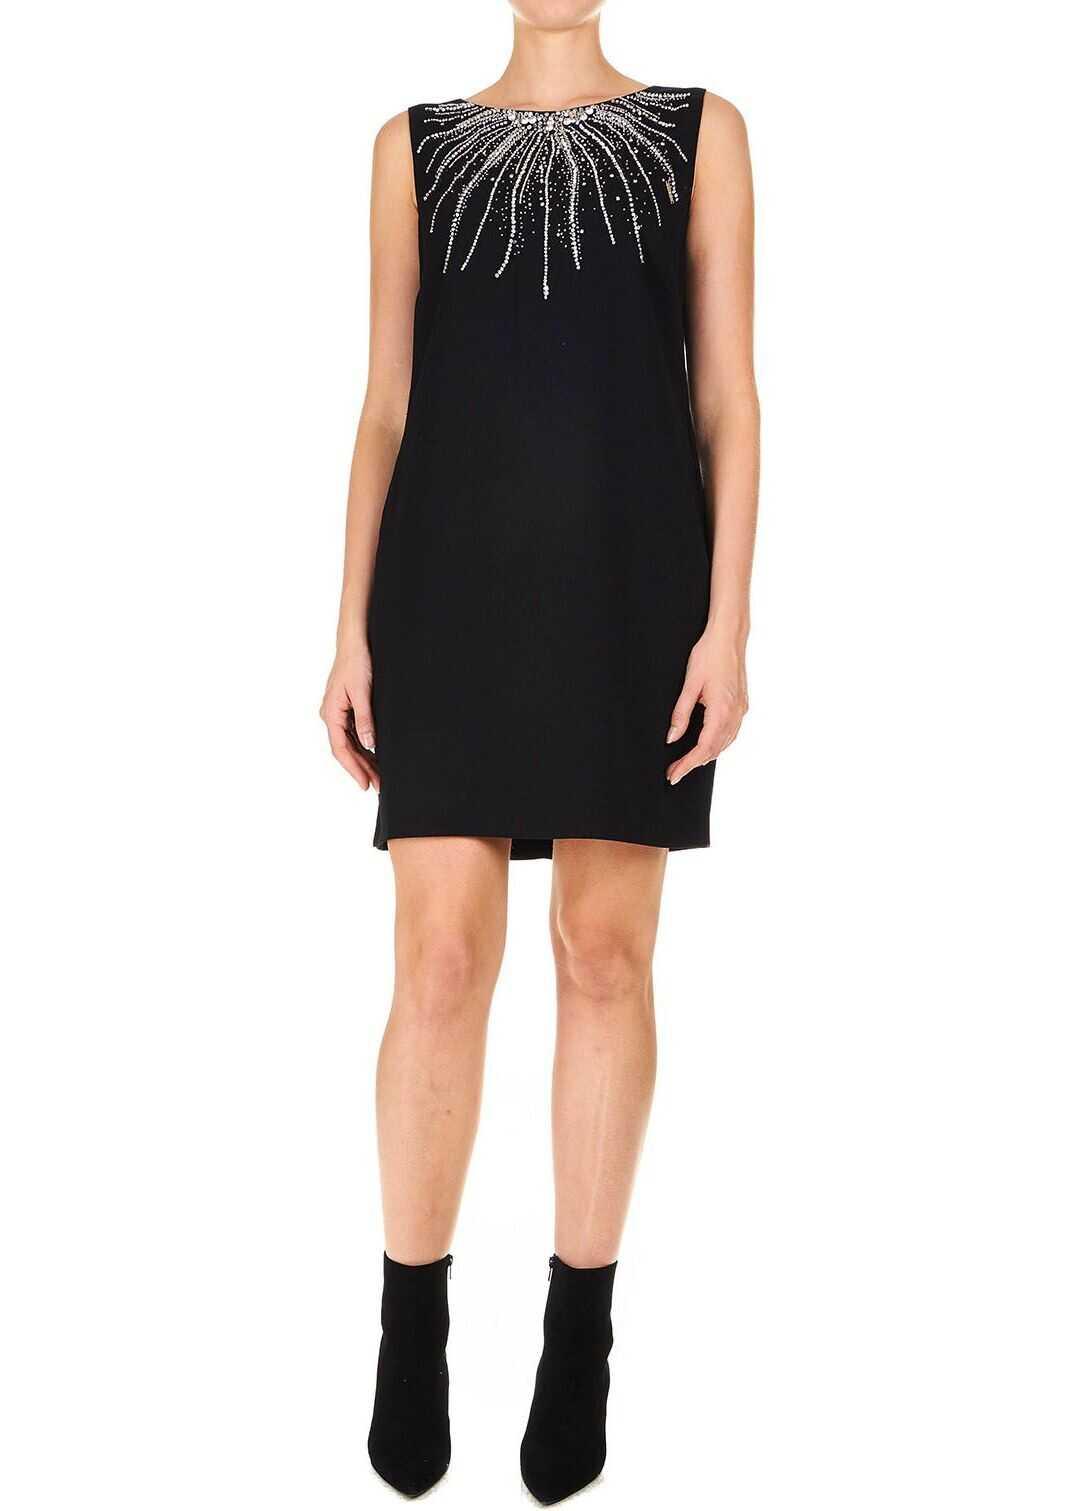 Liu Jo Polyester Dress BLACK